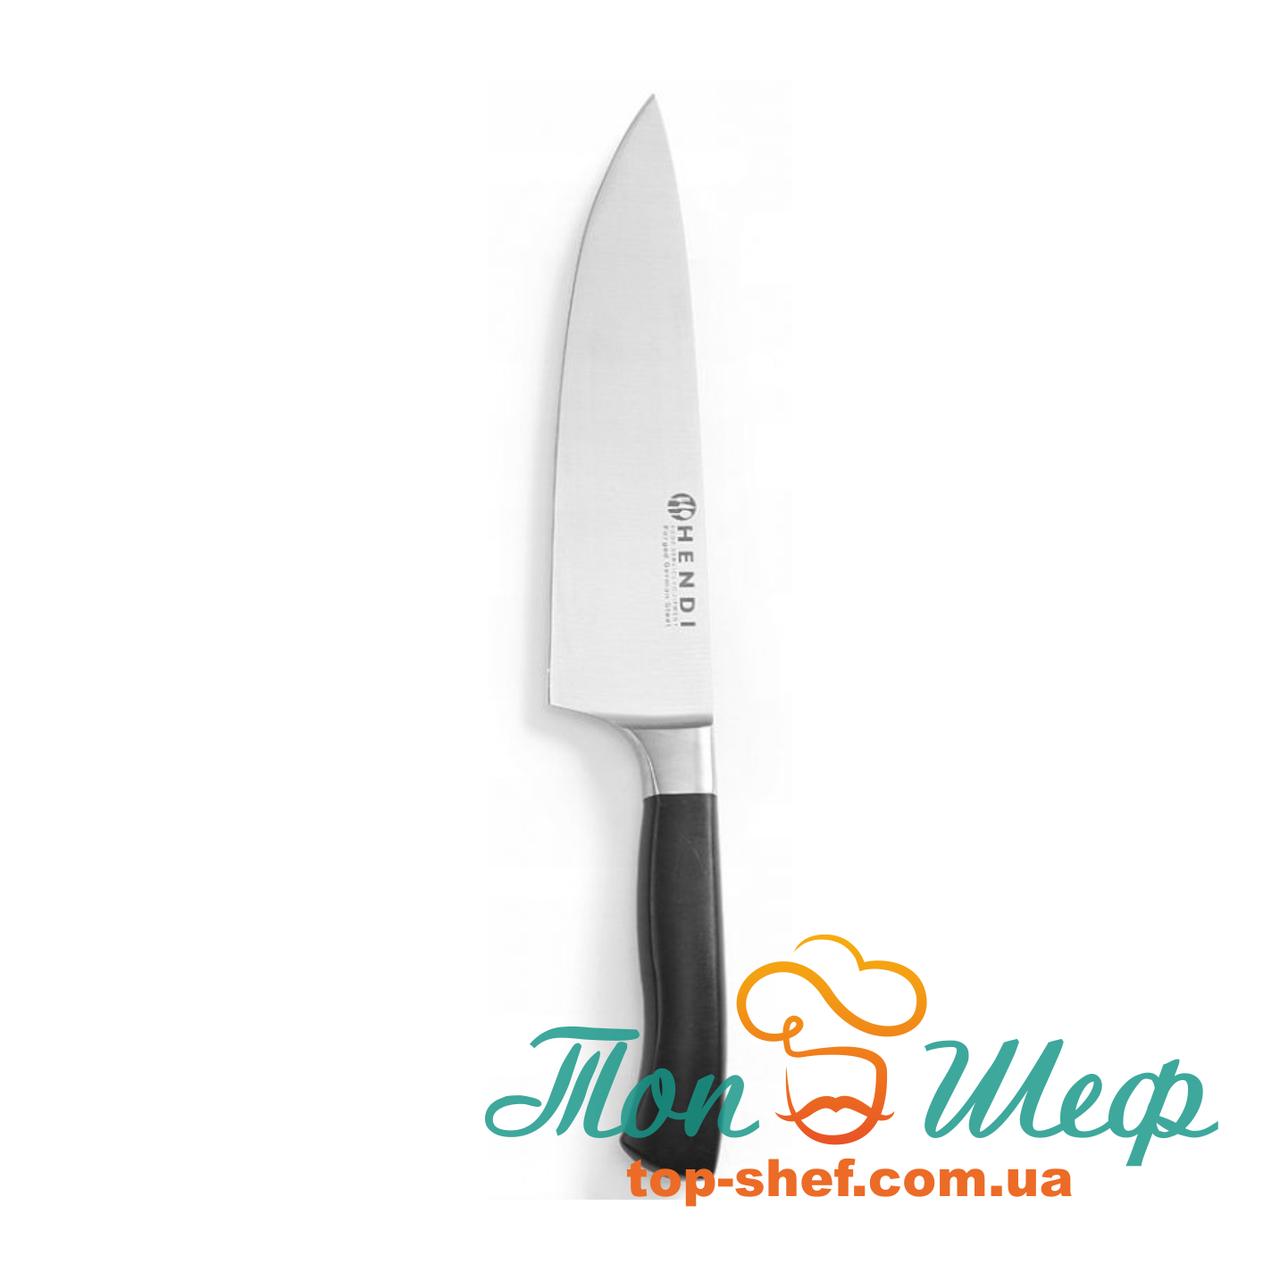 Нож поварской Hendi 844212